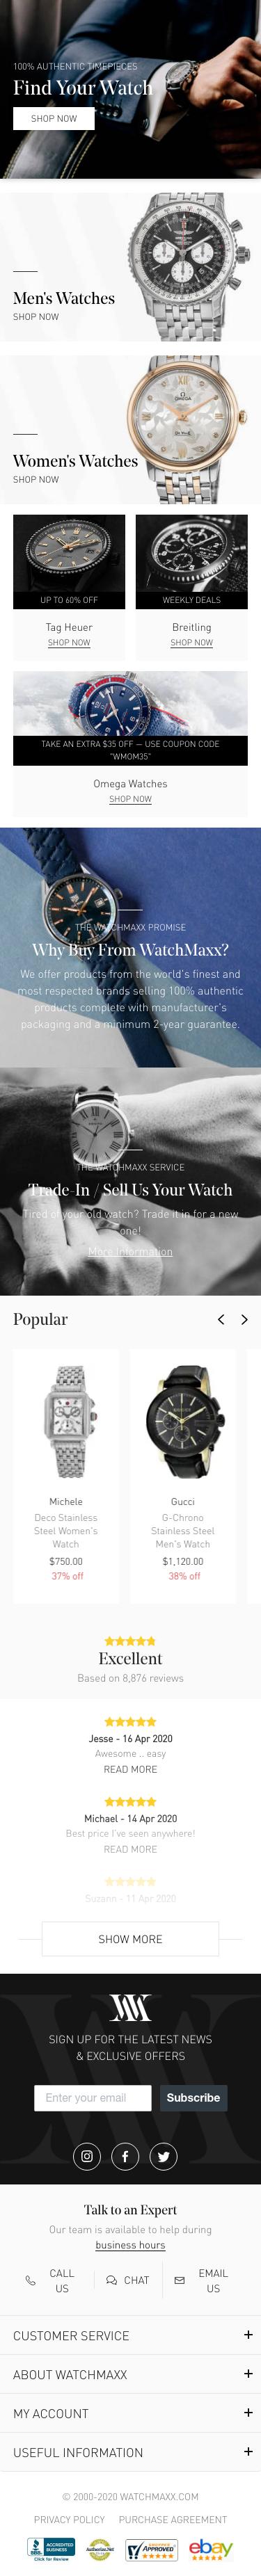 WatchMaxx Coupon